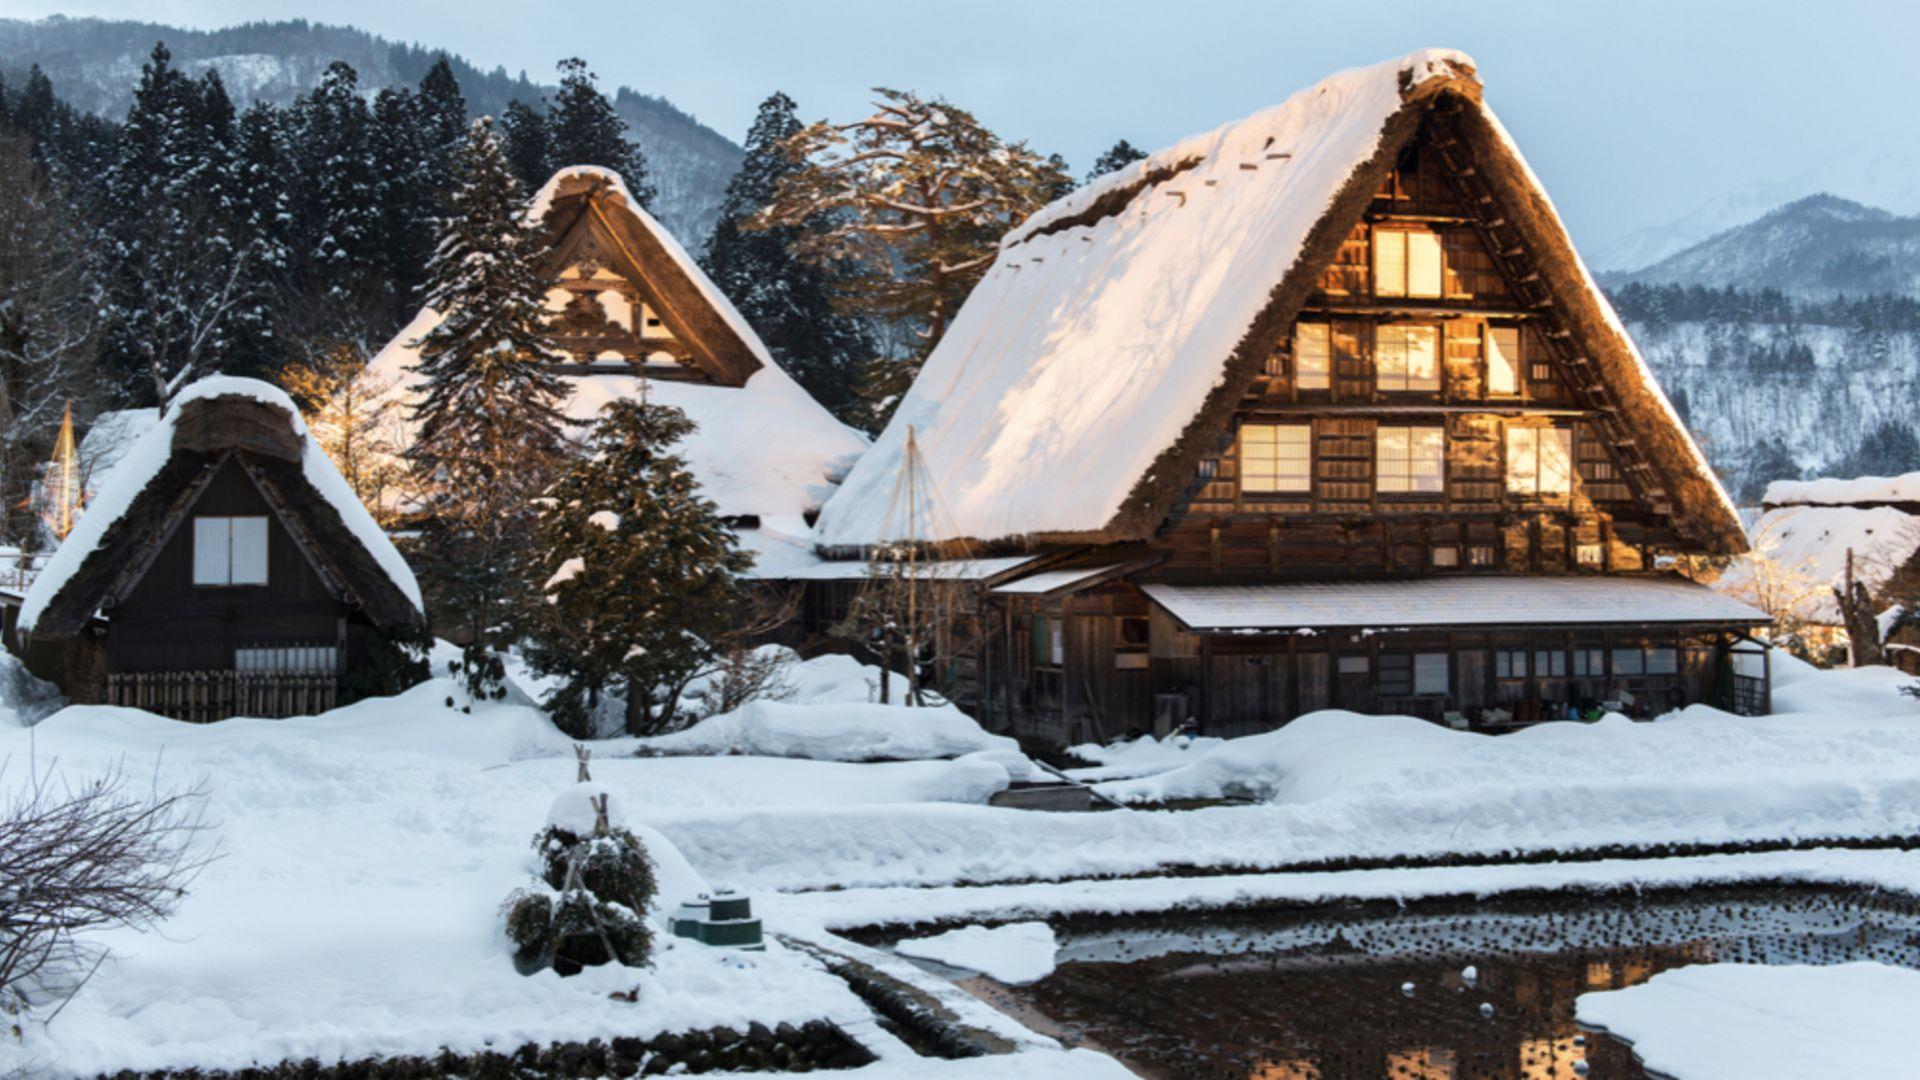 Tohoku Snow Monsters Skiing Fruit Hiking Travel Japan Jnto